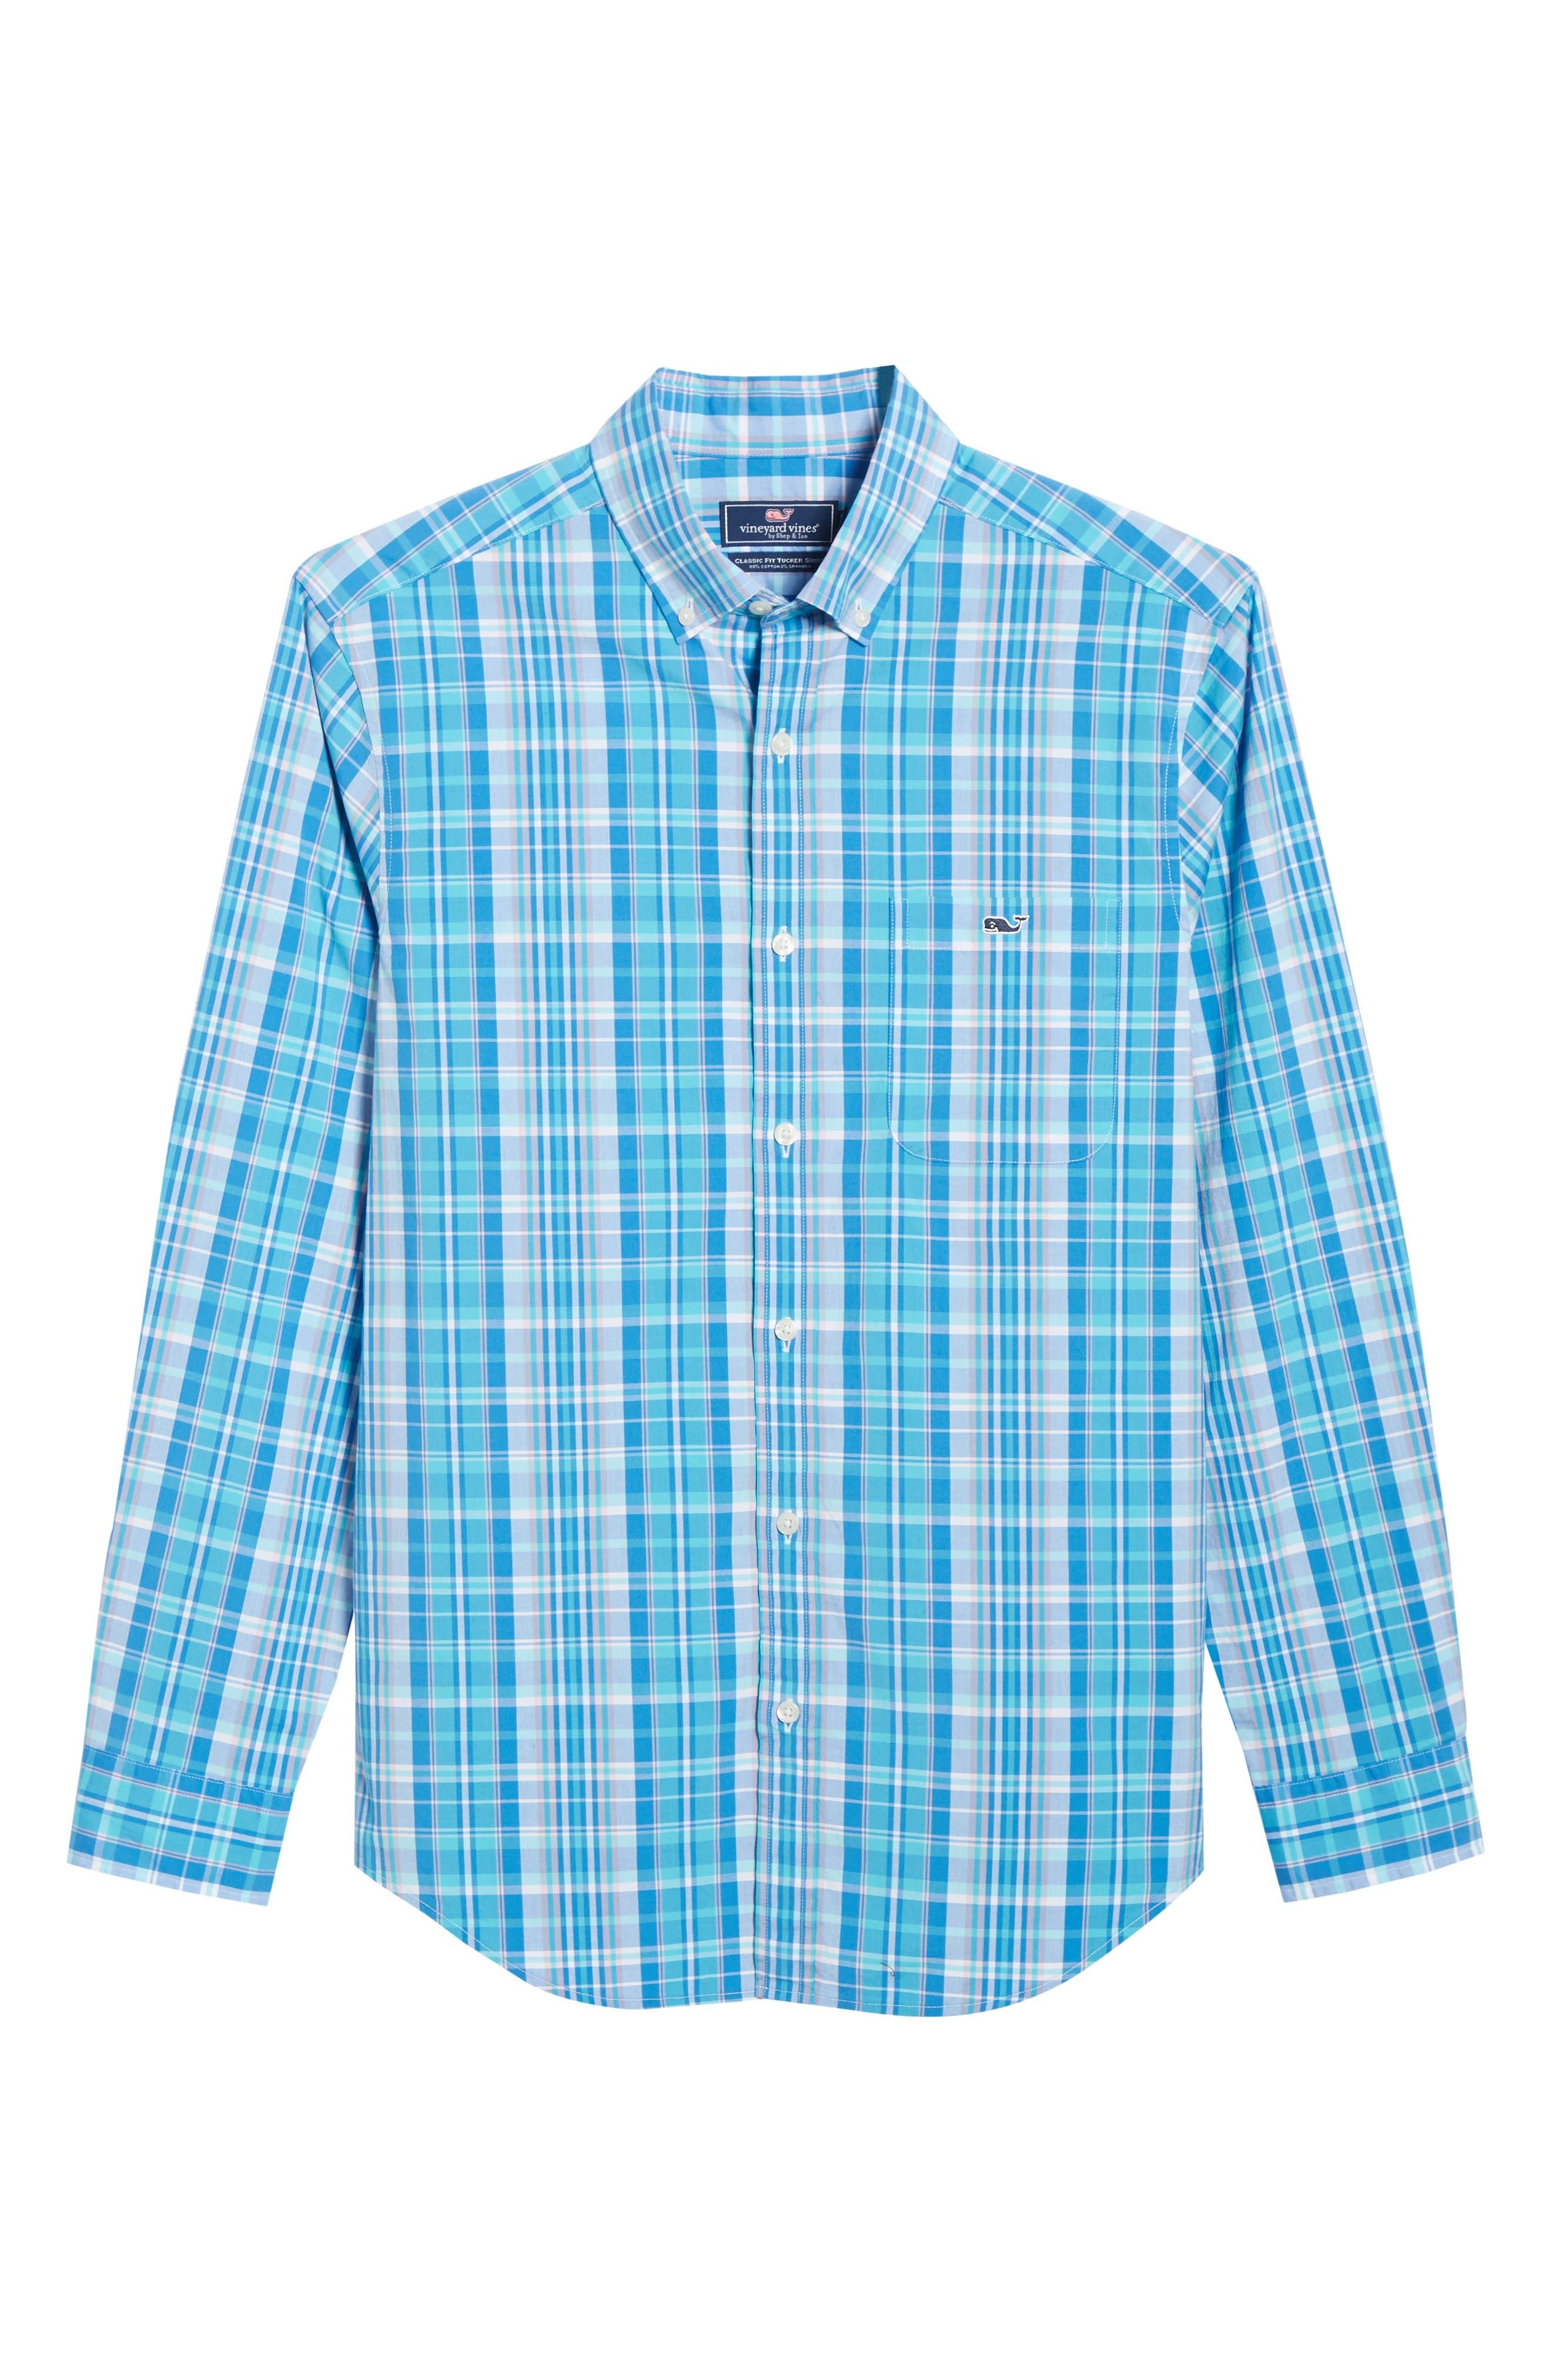 VINEYARD VINES, Tucker Regular Fit Plaid Sport Shirt, Alternate thumbnail 5, color, JAKE BLUE